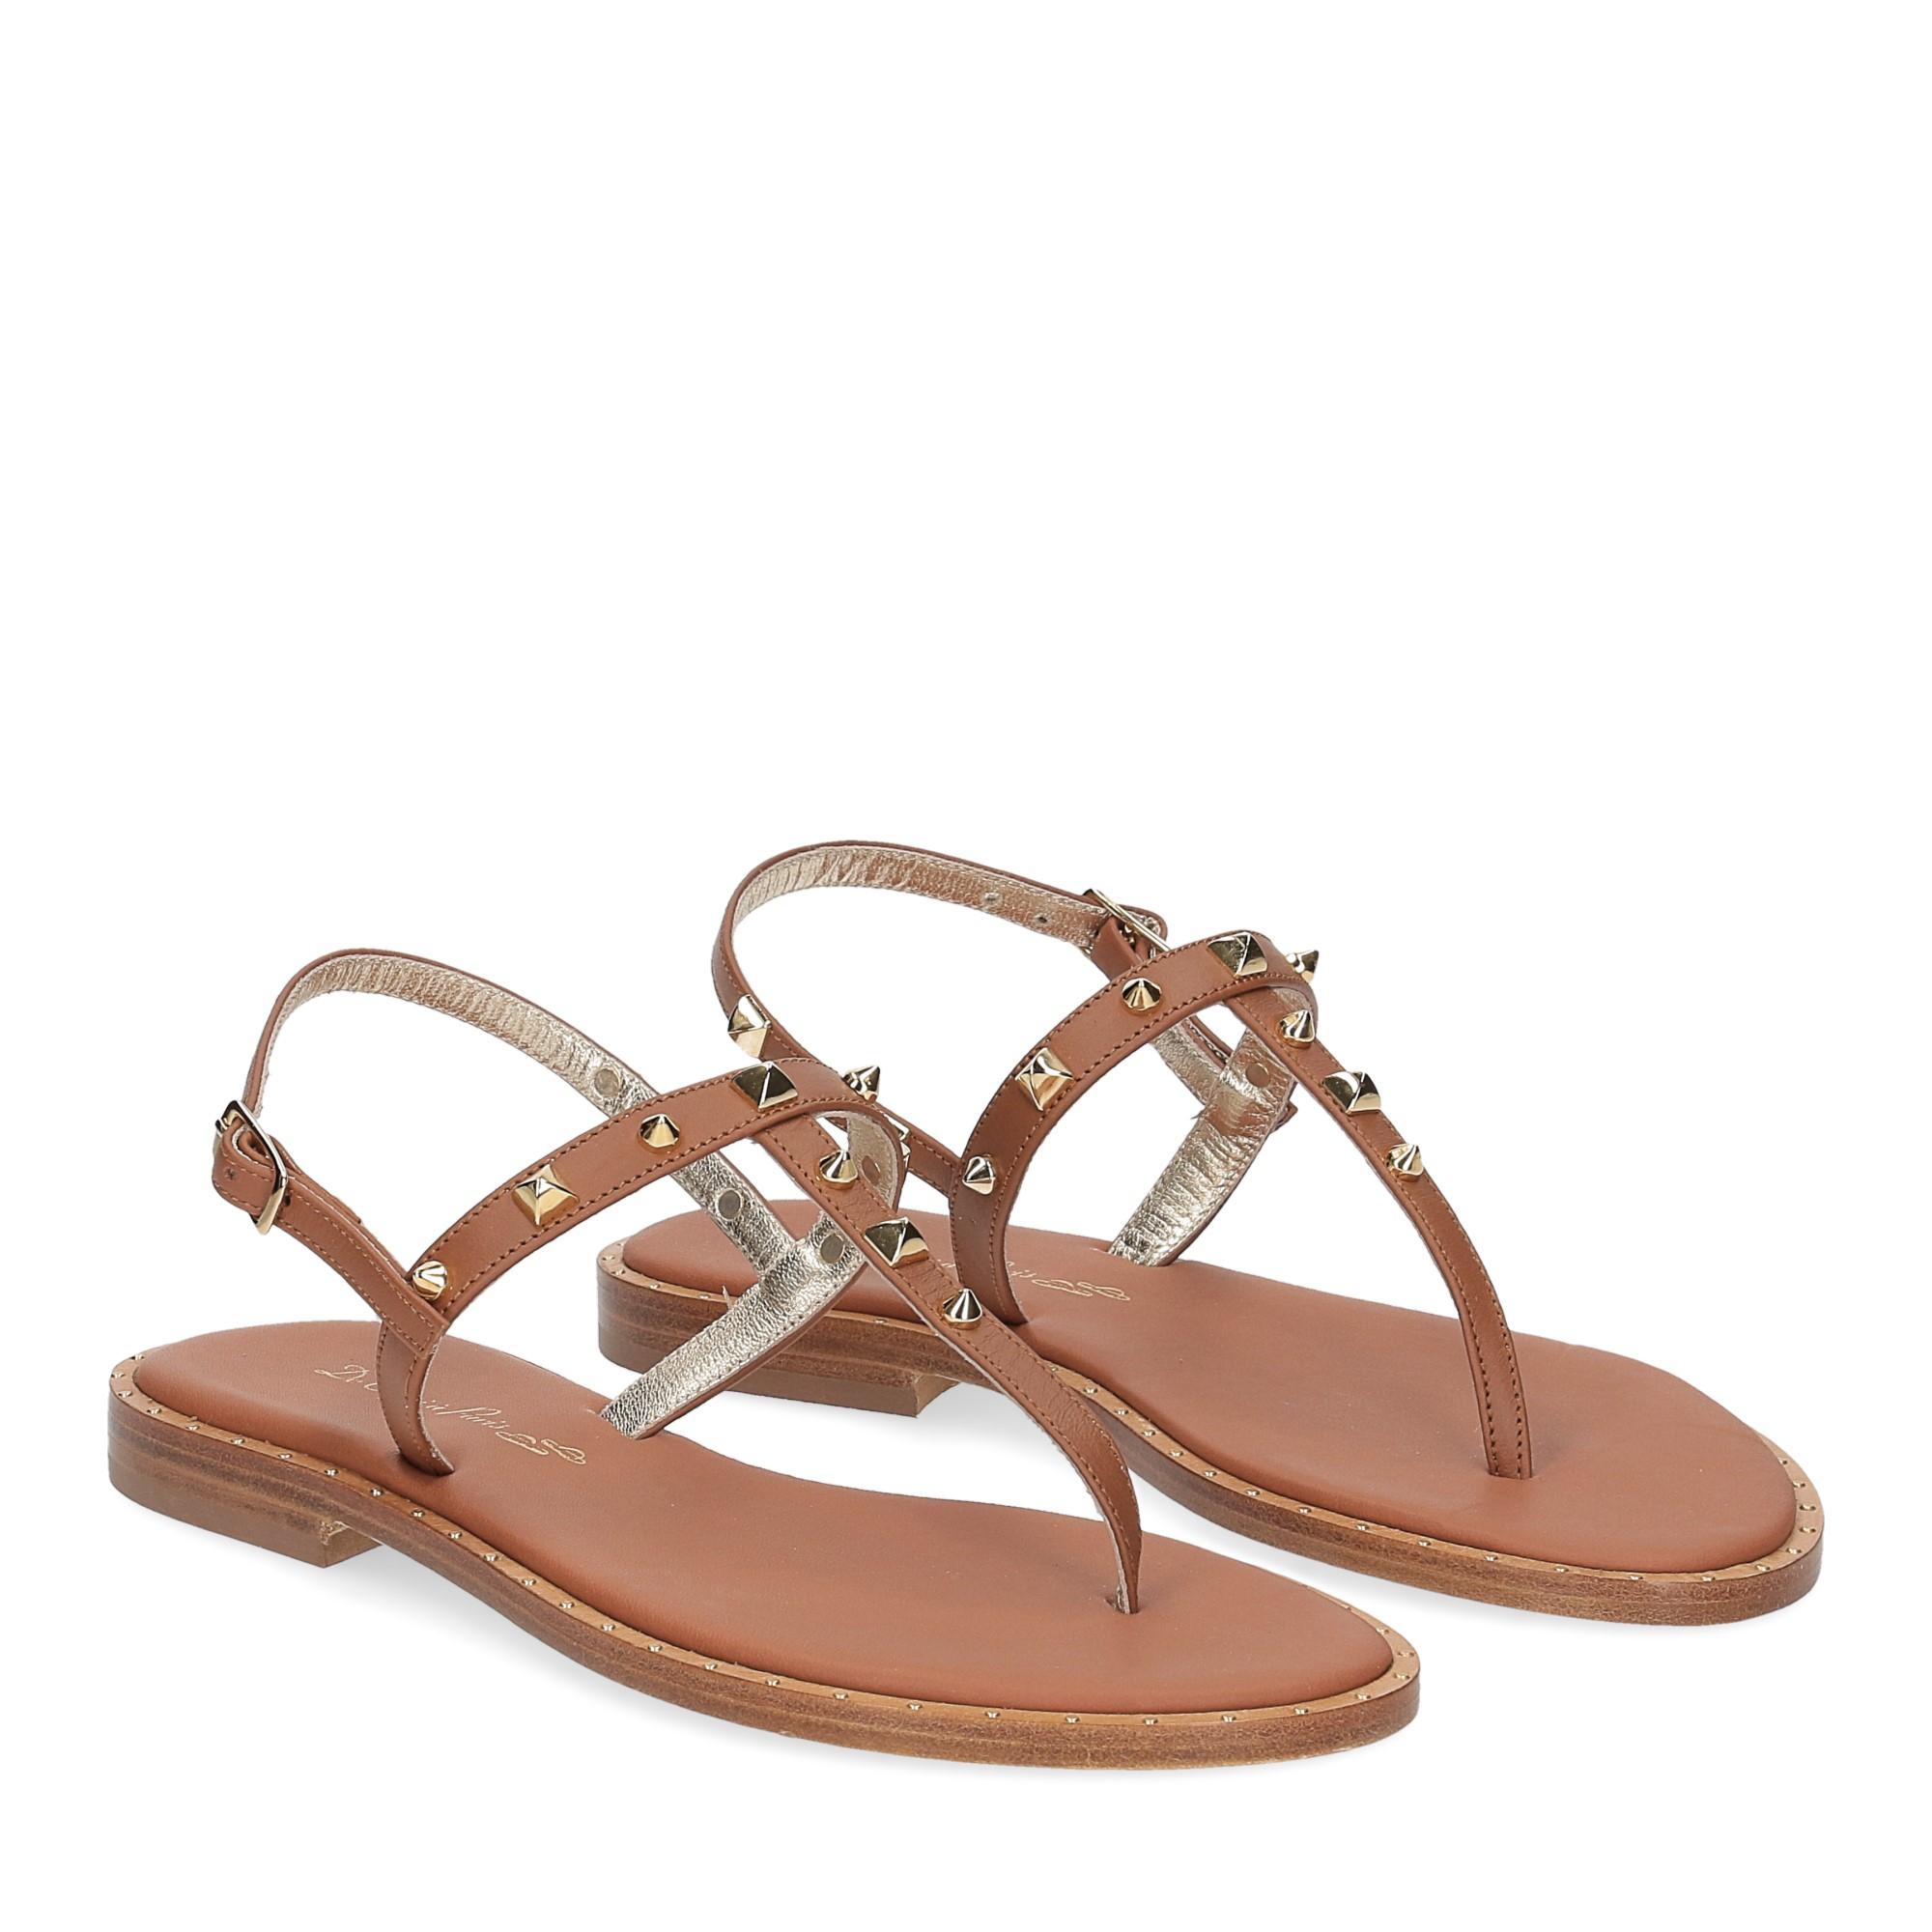 De Capri a Paris sandalo infradito pelle cuoio